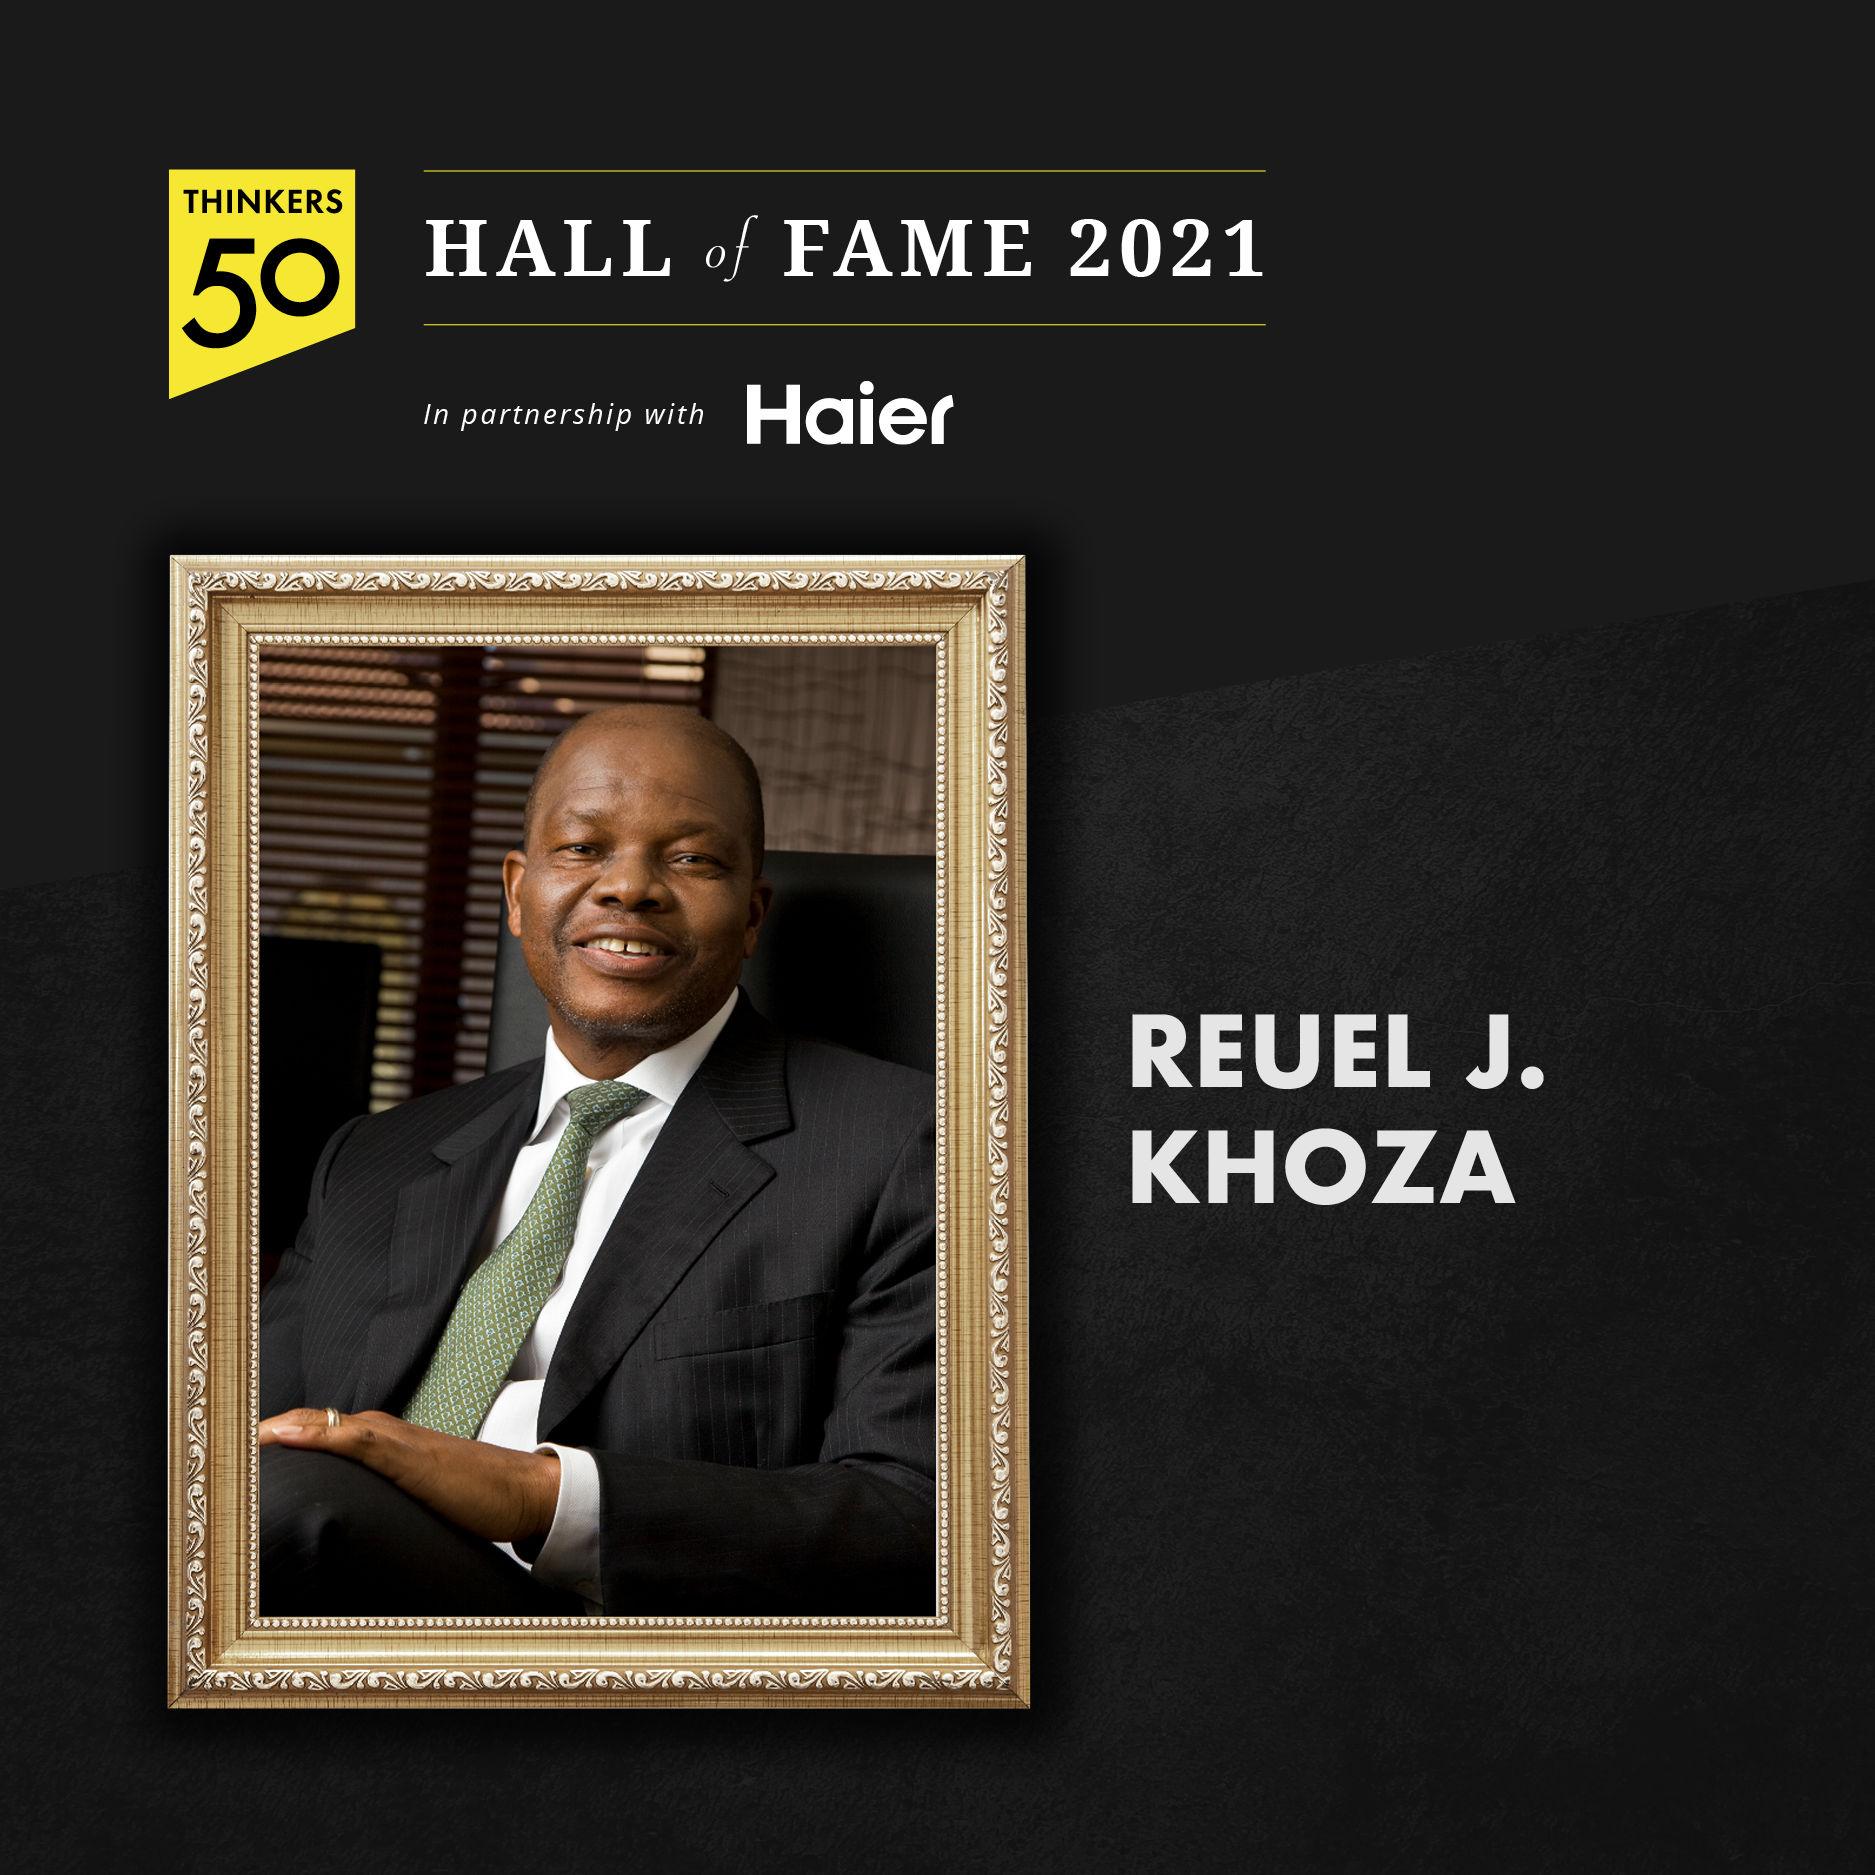 Reuel J. Khoza Hall of Fame